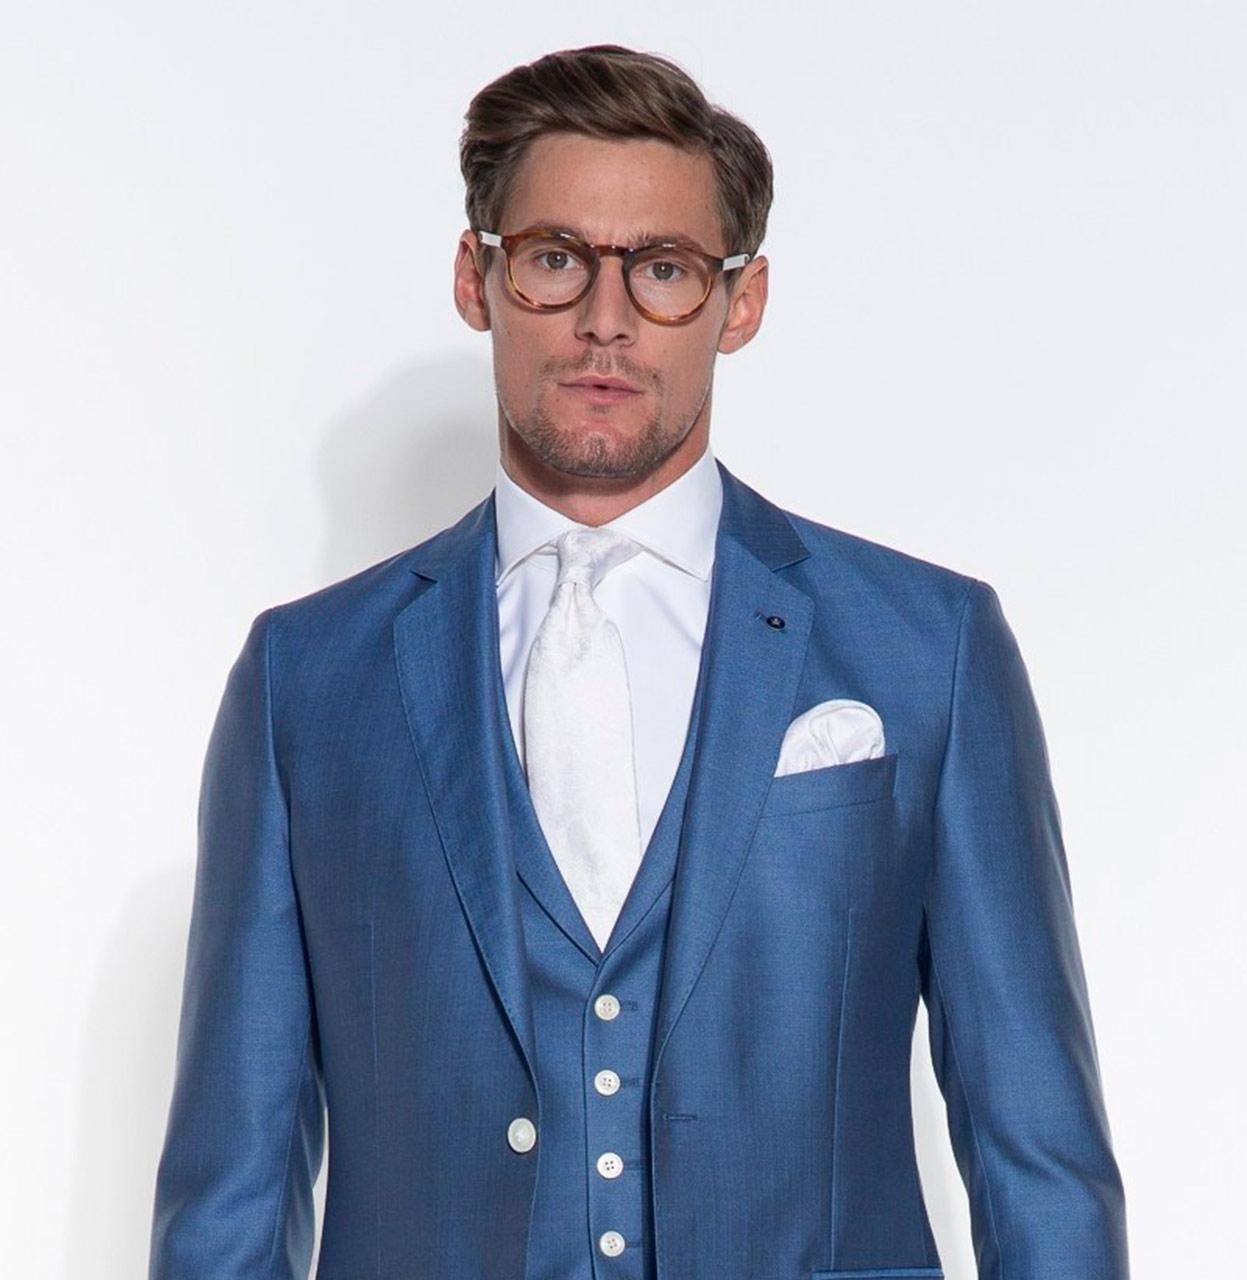 Dutch Dandies Trouwkostuum 044298 300 Blauw 044298 blauw Maat 46